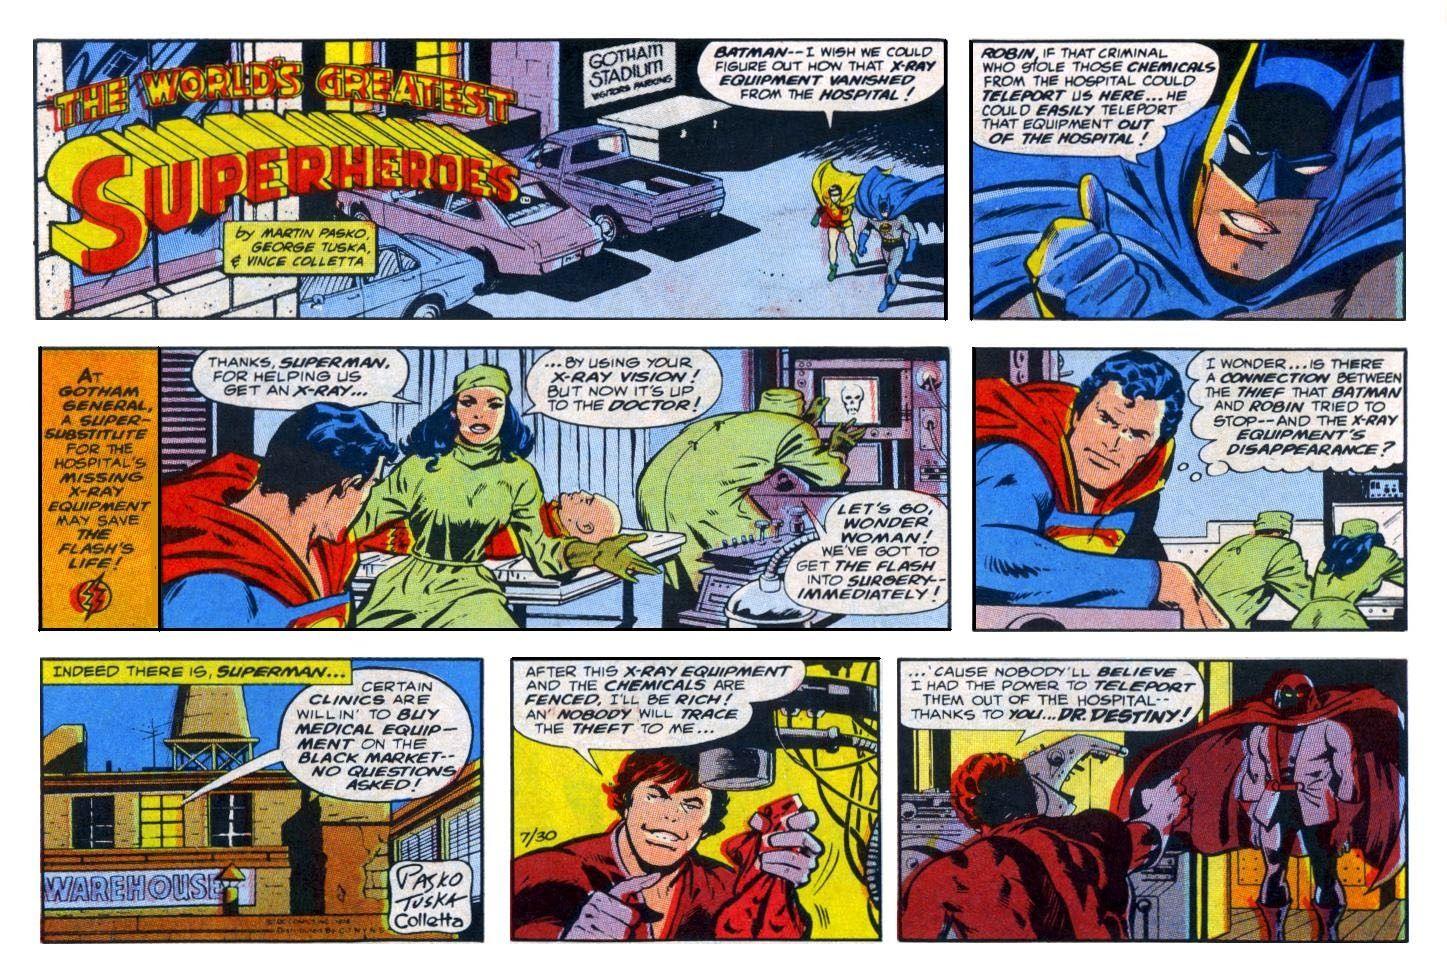 Super hero comic strip